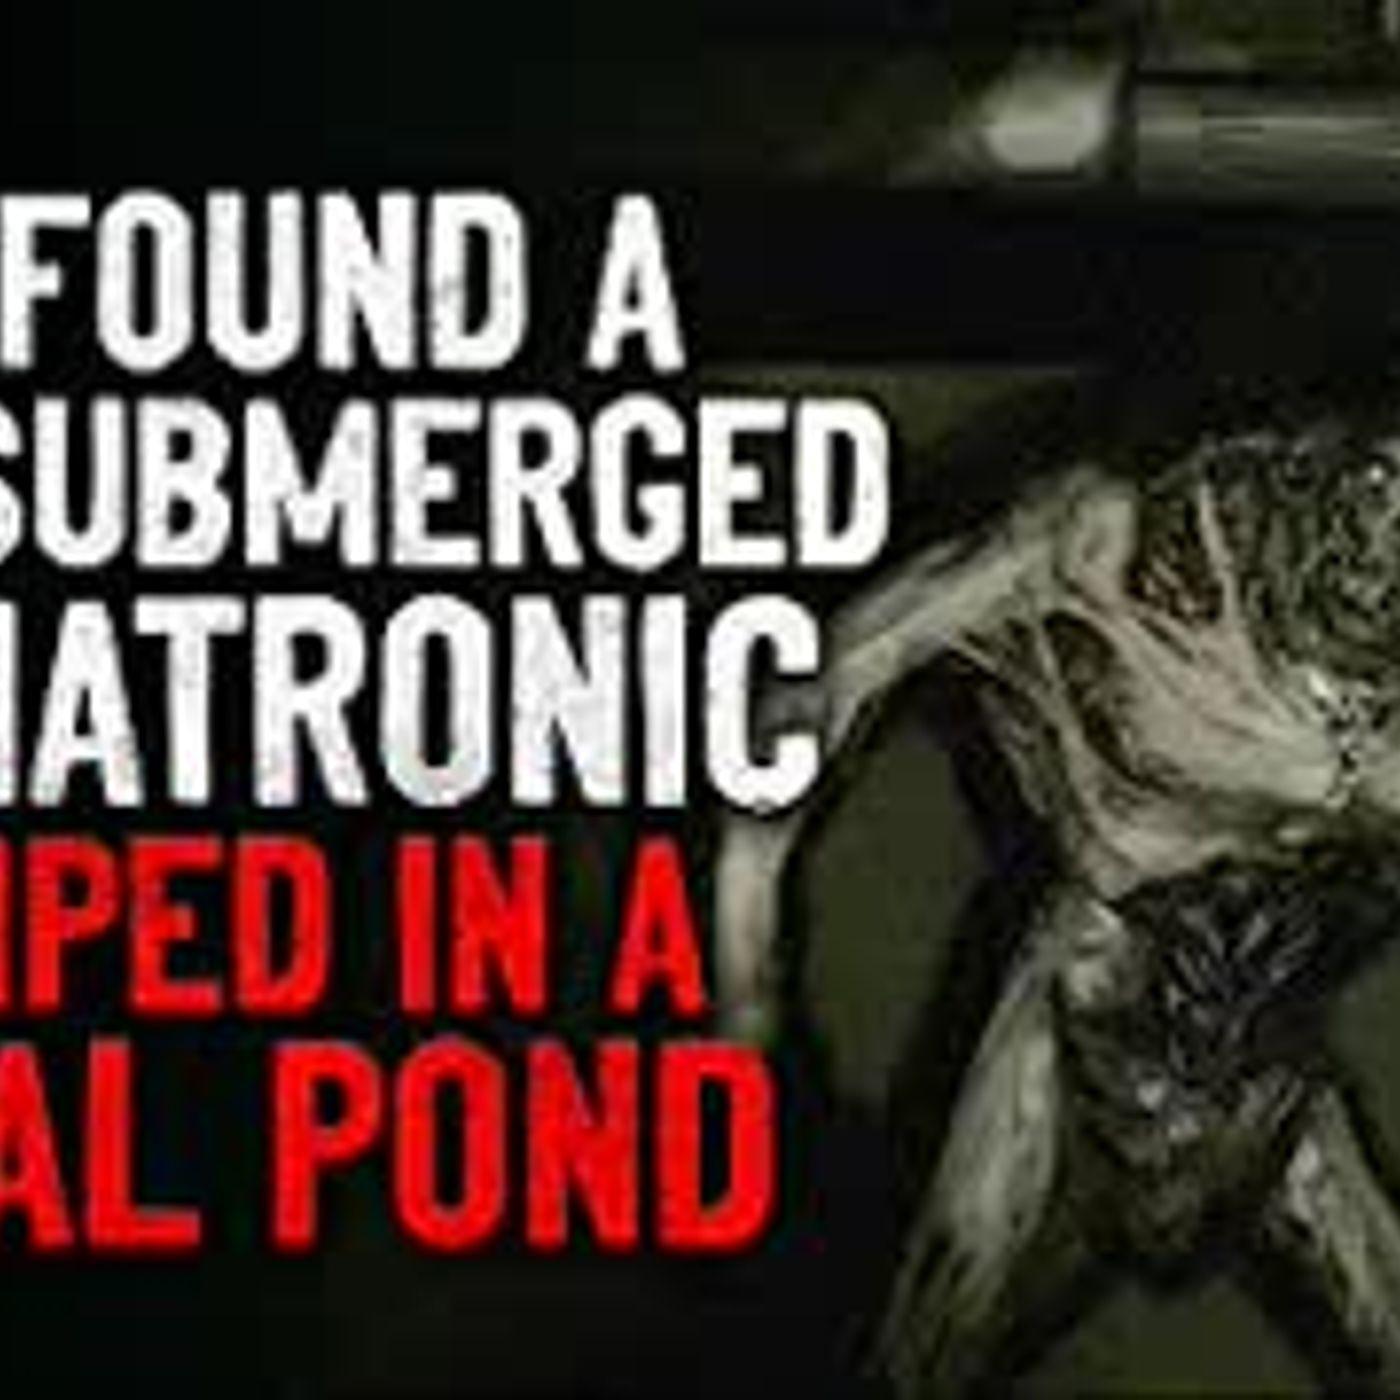 """We found a half submerged animatronic dumped in a local pond"" Creepypasta"